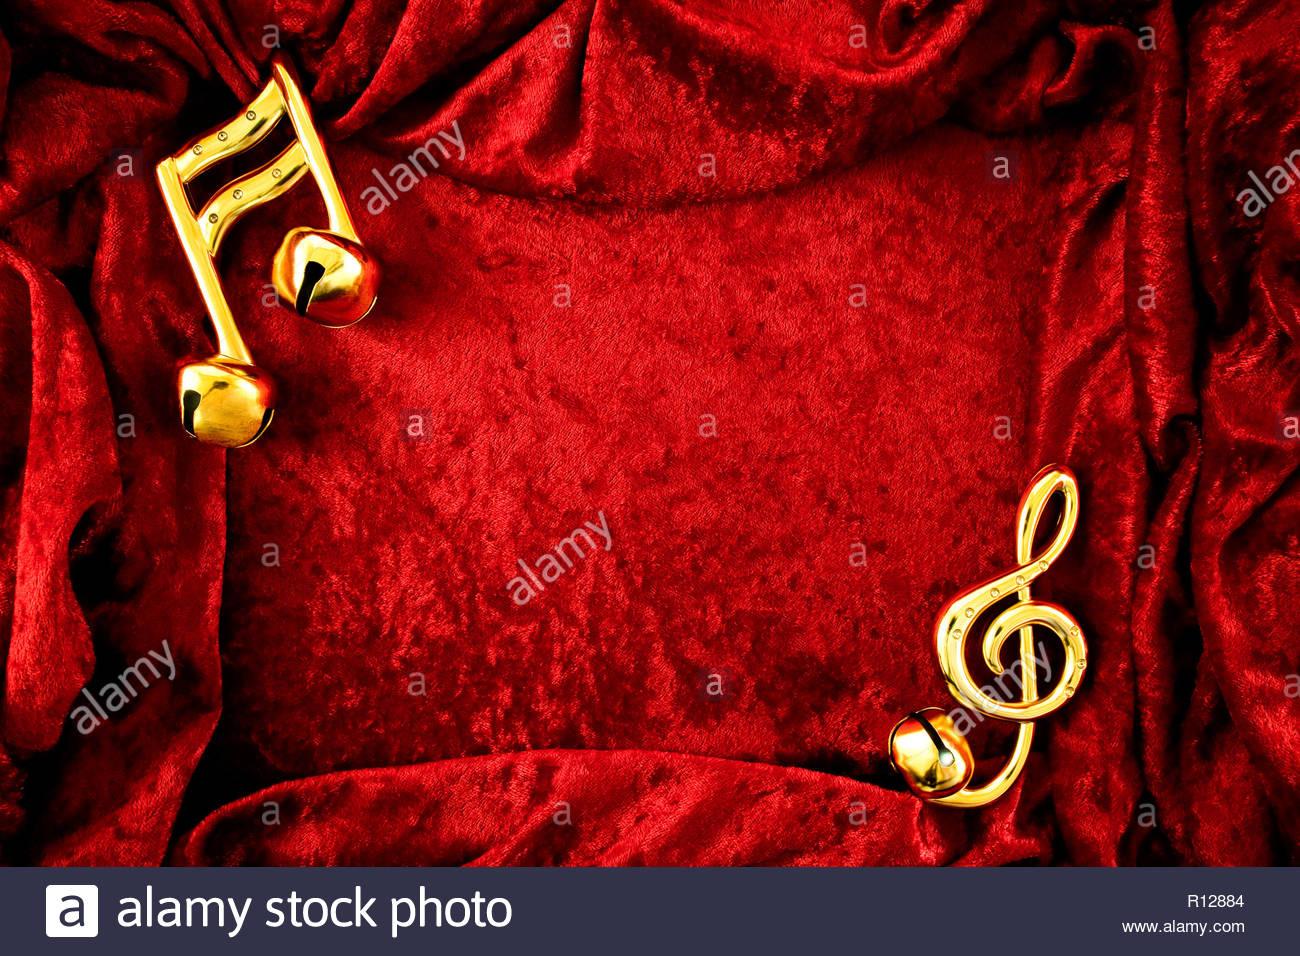 jingle bells background music